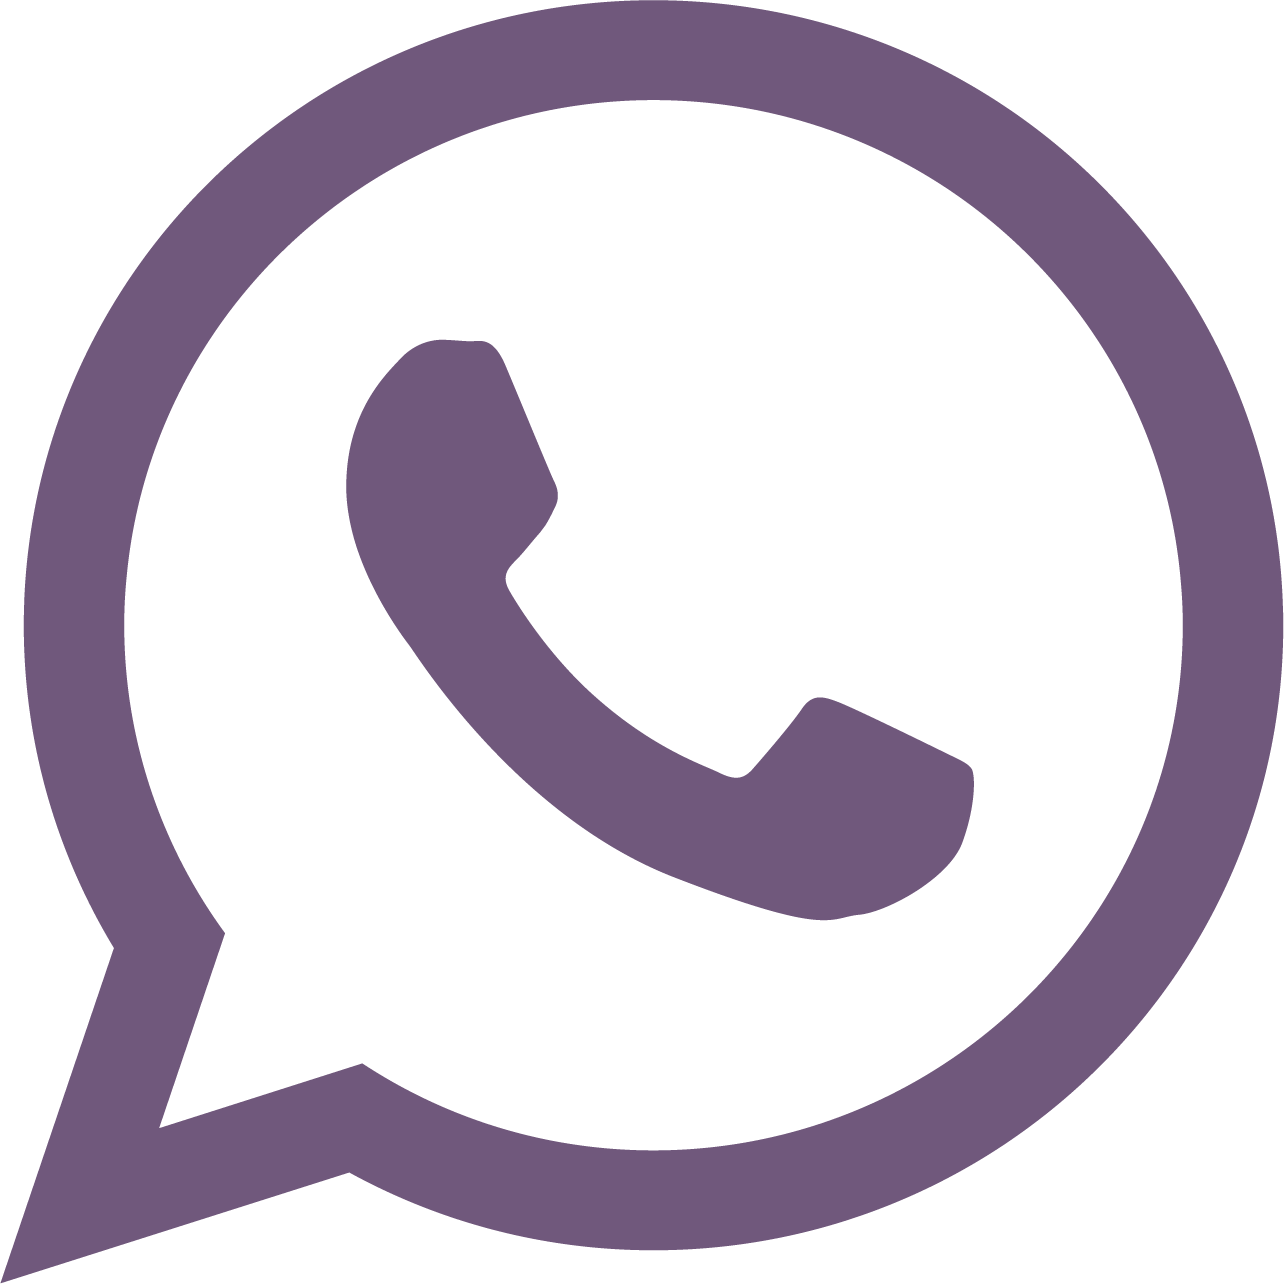 contact-whatsapp